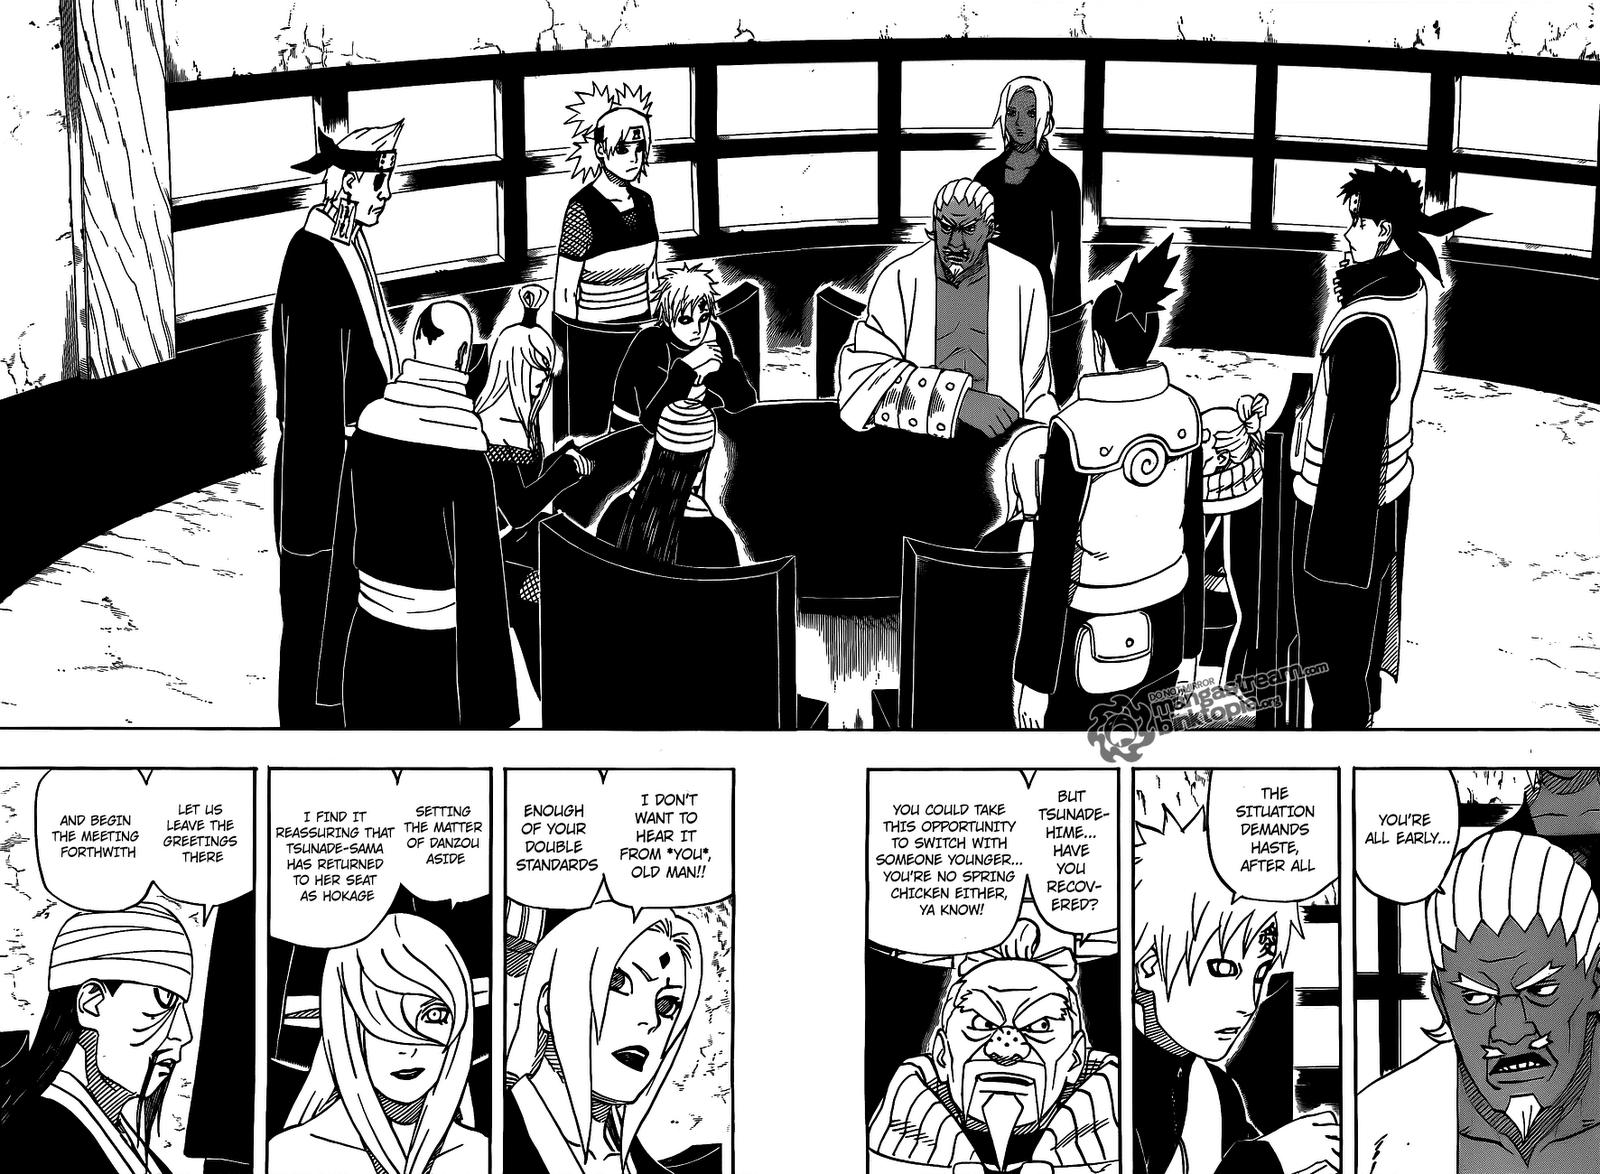 naruto shippuden sex scandal